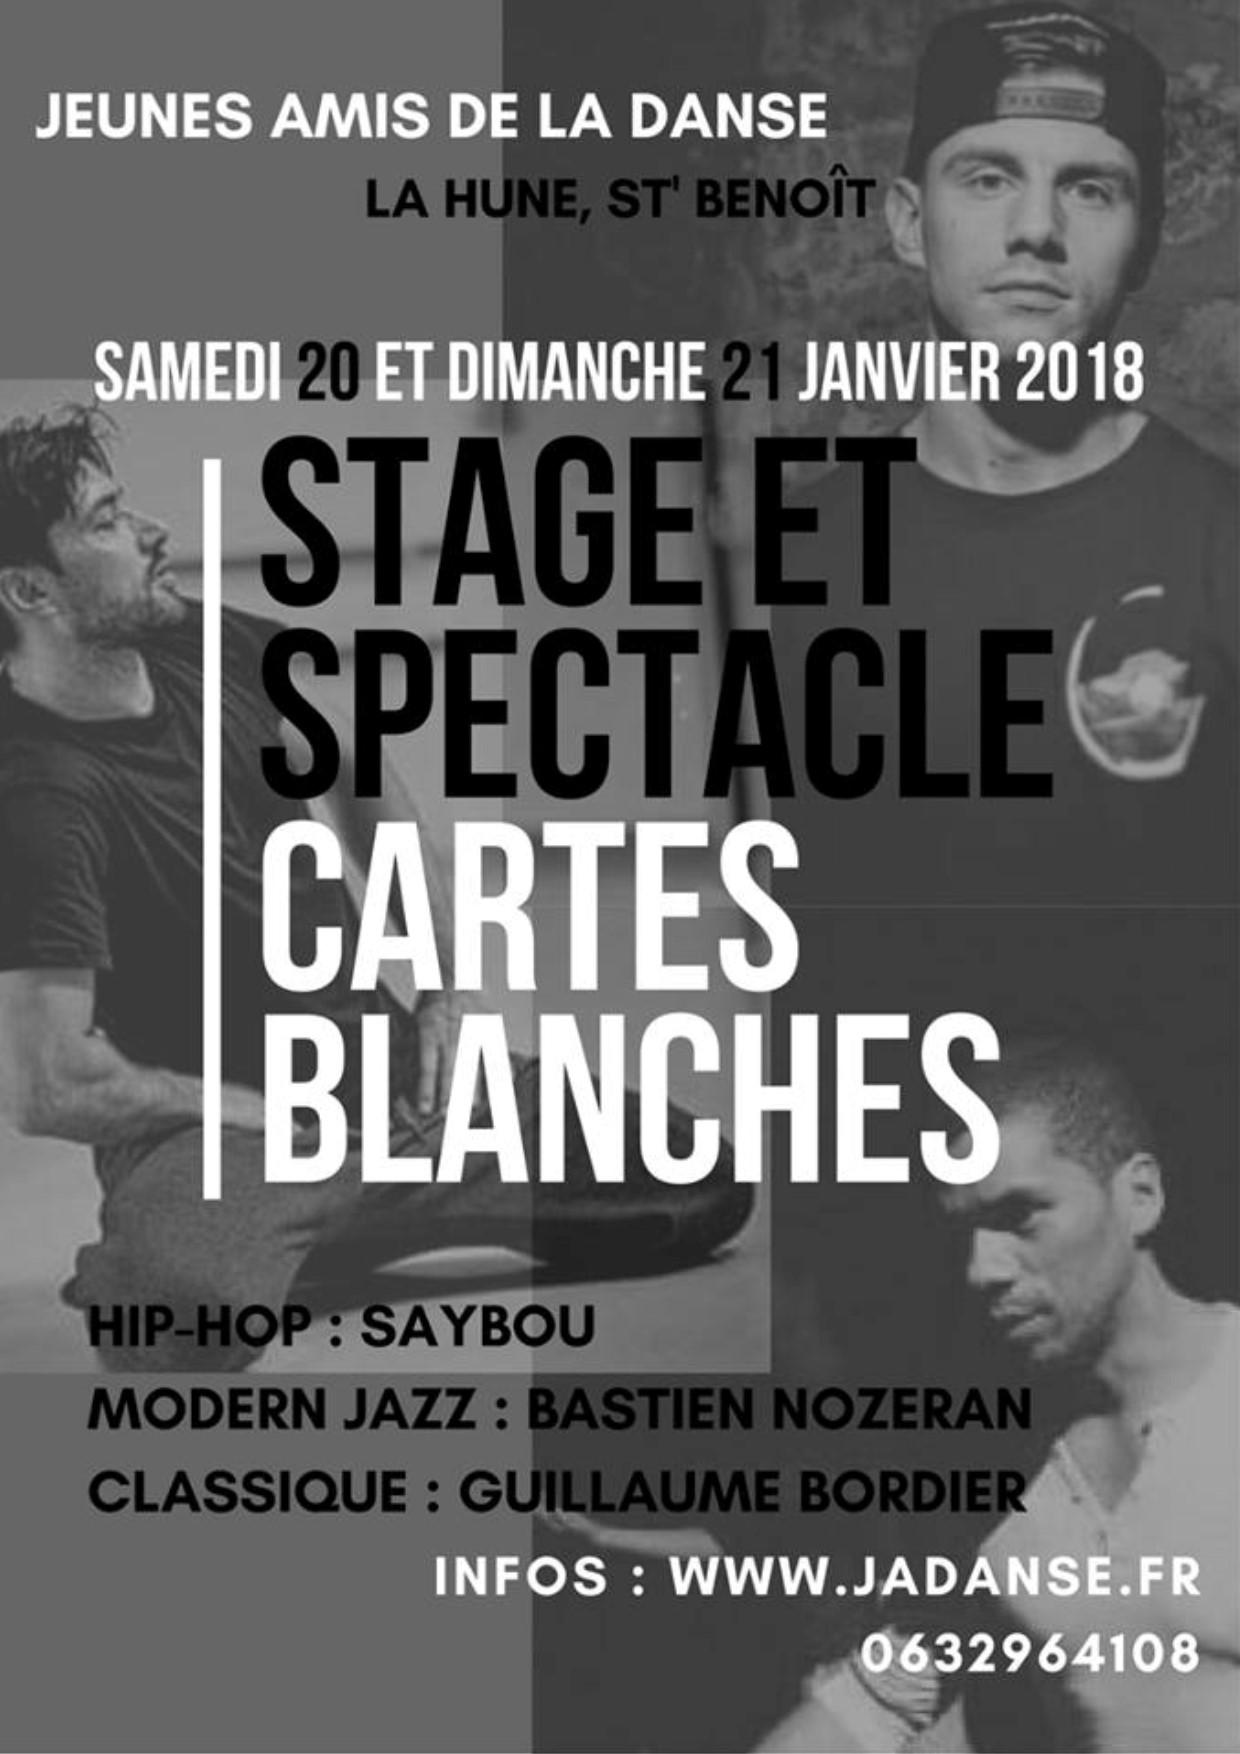 Cartes blanches 2018